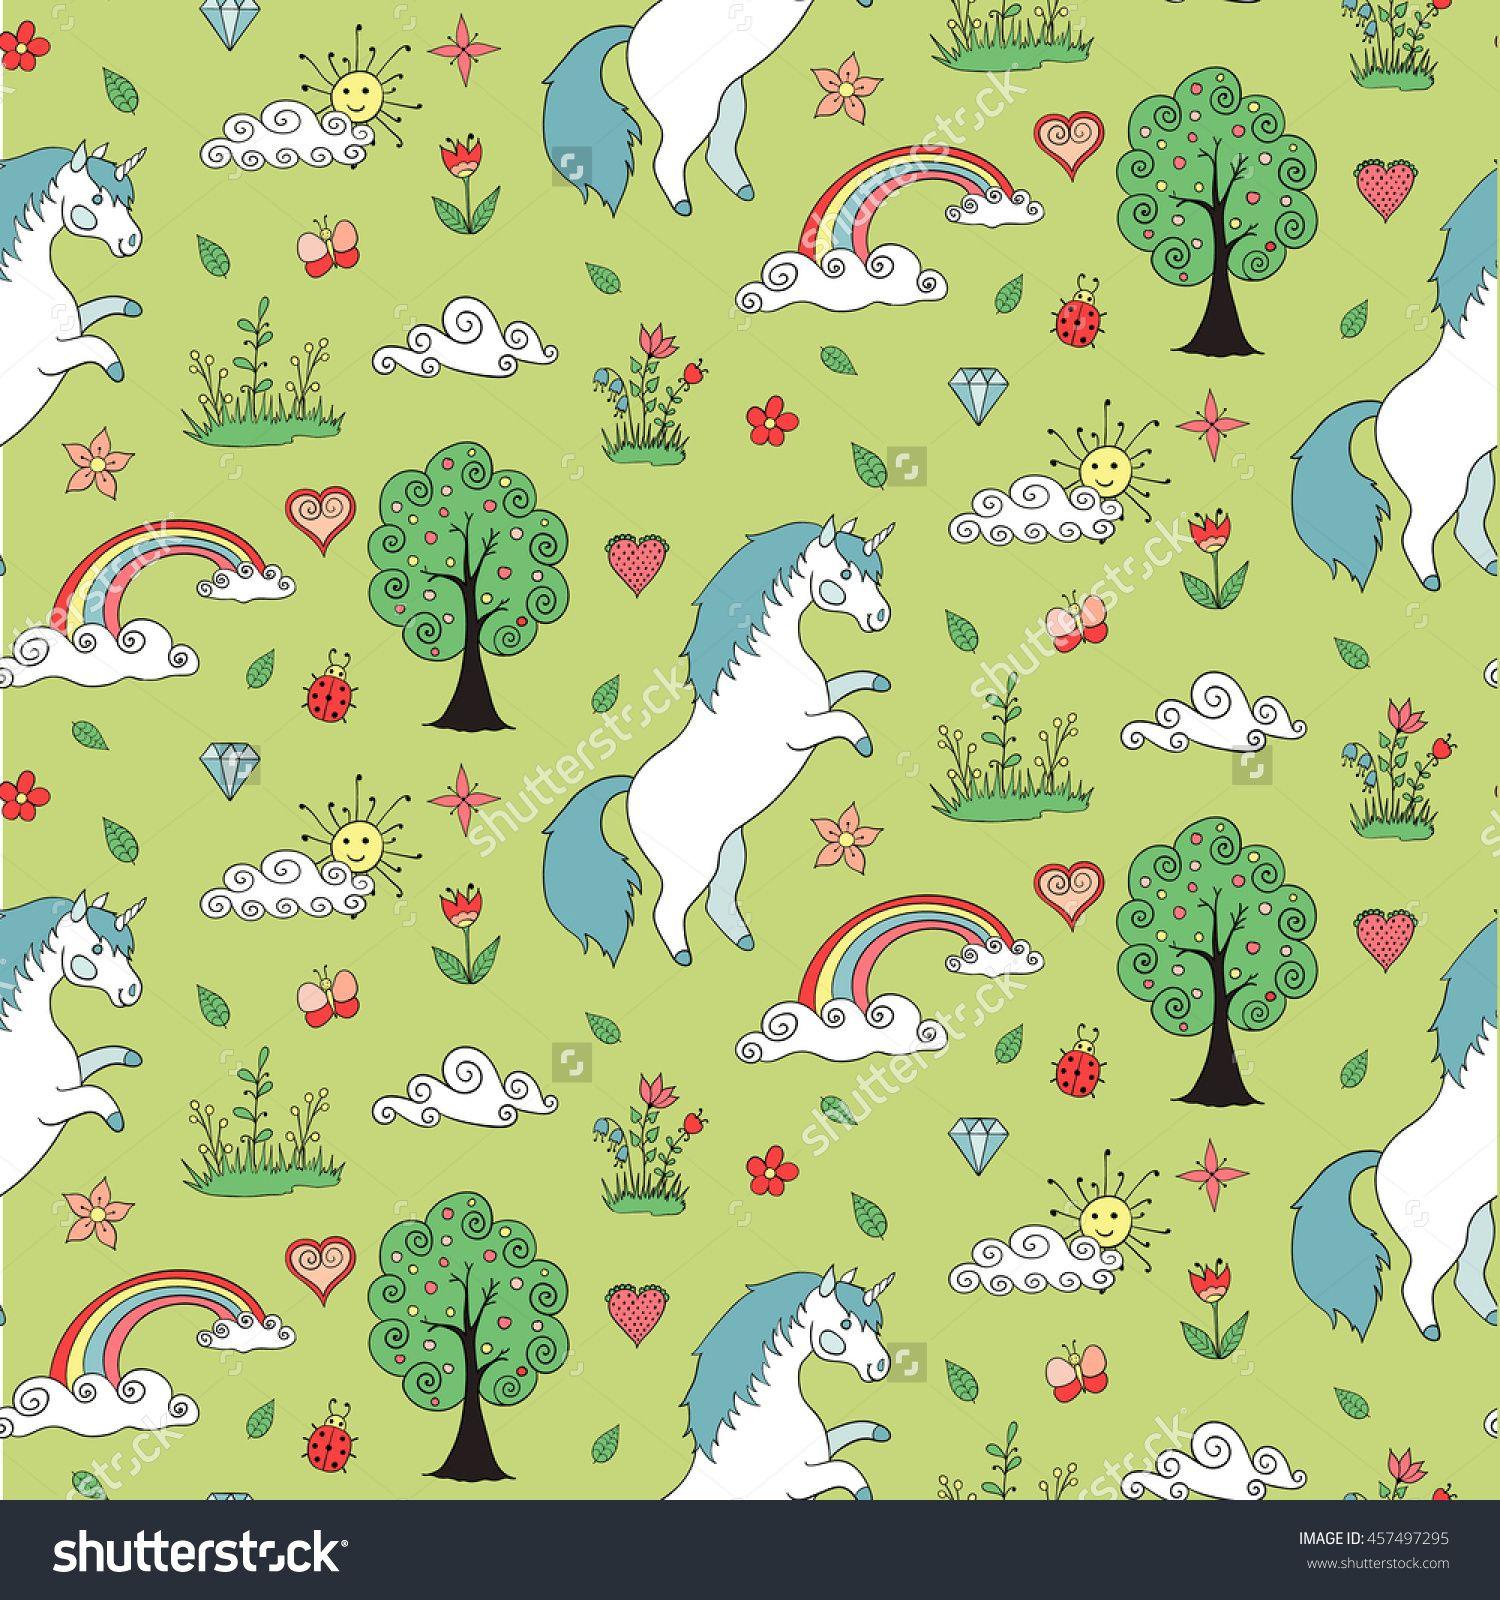 Most Inspiring Wallpaper Horse Cartoon - 3ecb3b8394fc842890ff7b217279229c  Graphic_319877.jpg